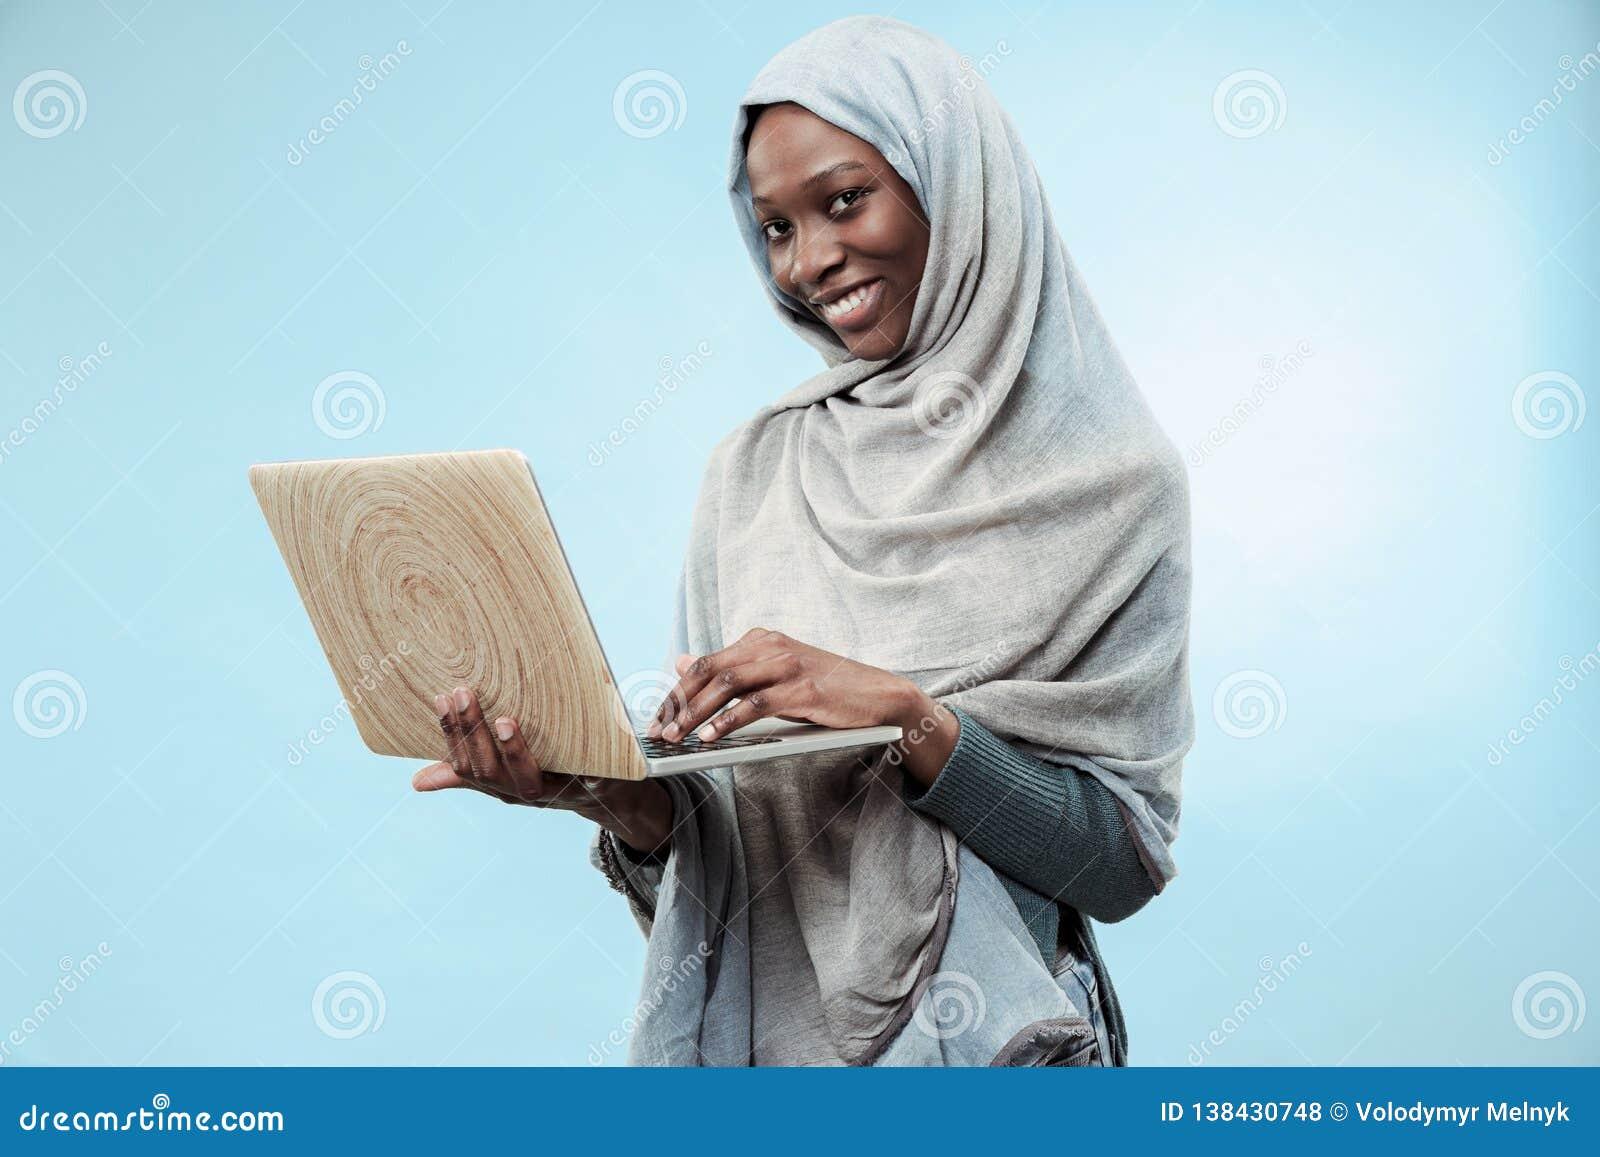 Portrait Of Female University Student Working on laptop